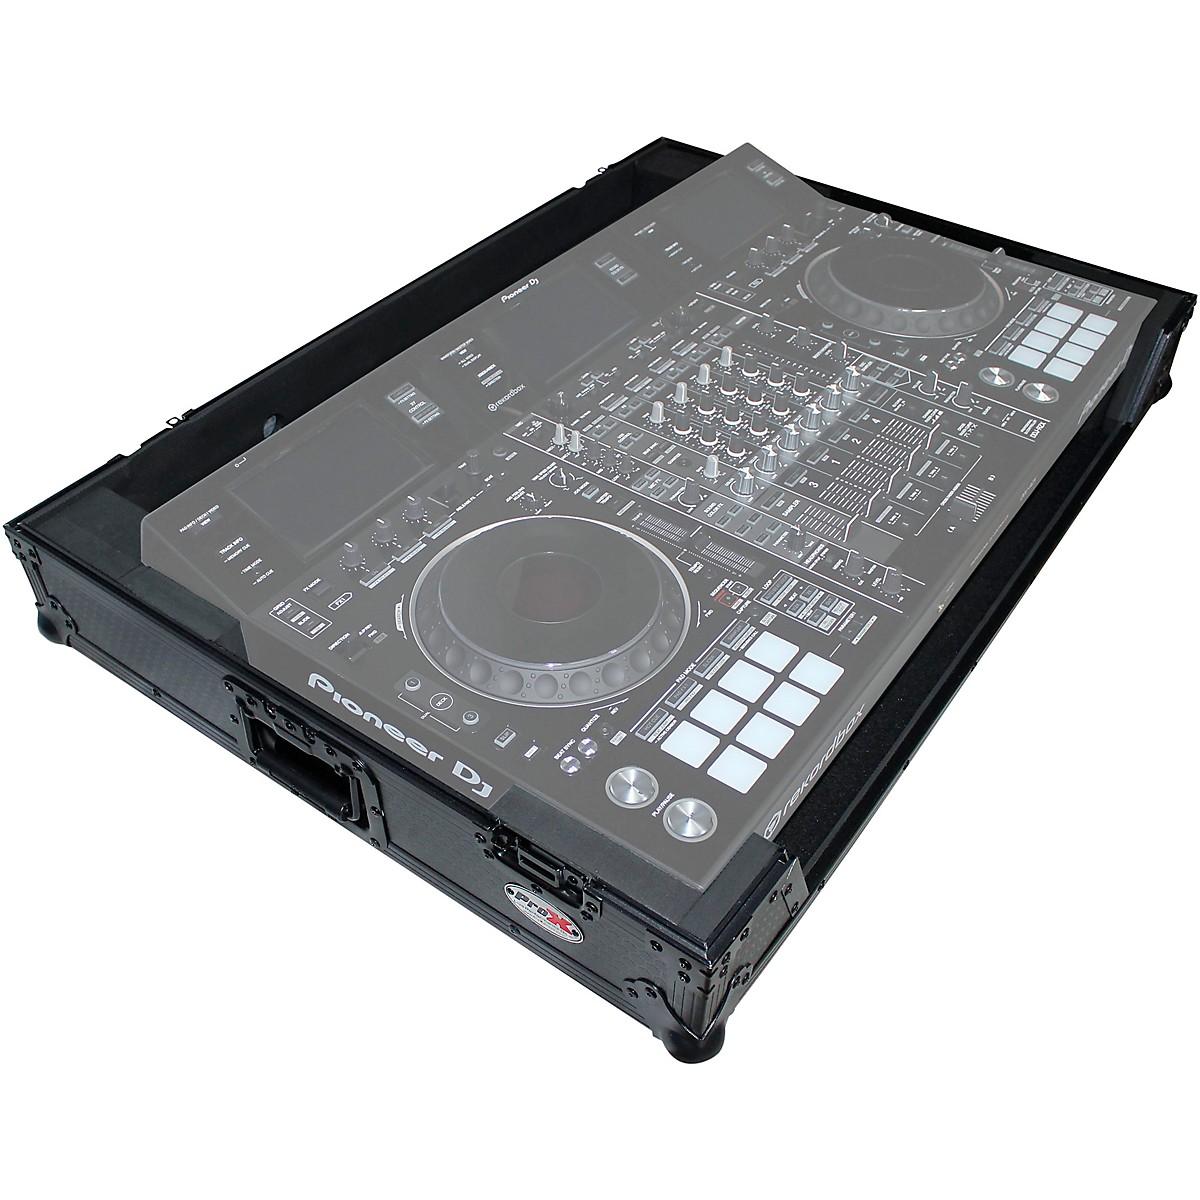 ProX XS-DDJRZXWBL Black ATA Style Flight Road Case for Pioneer DDJ-RZX DJ Controller with Wheels